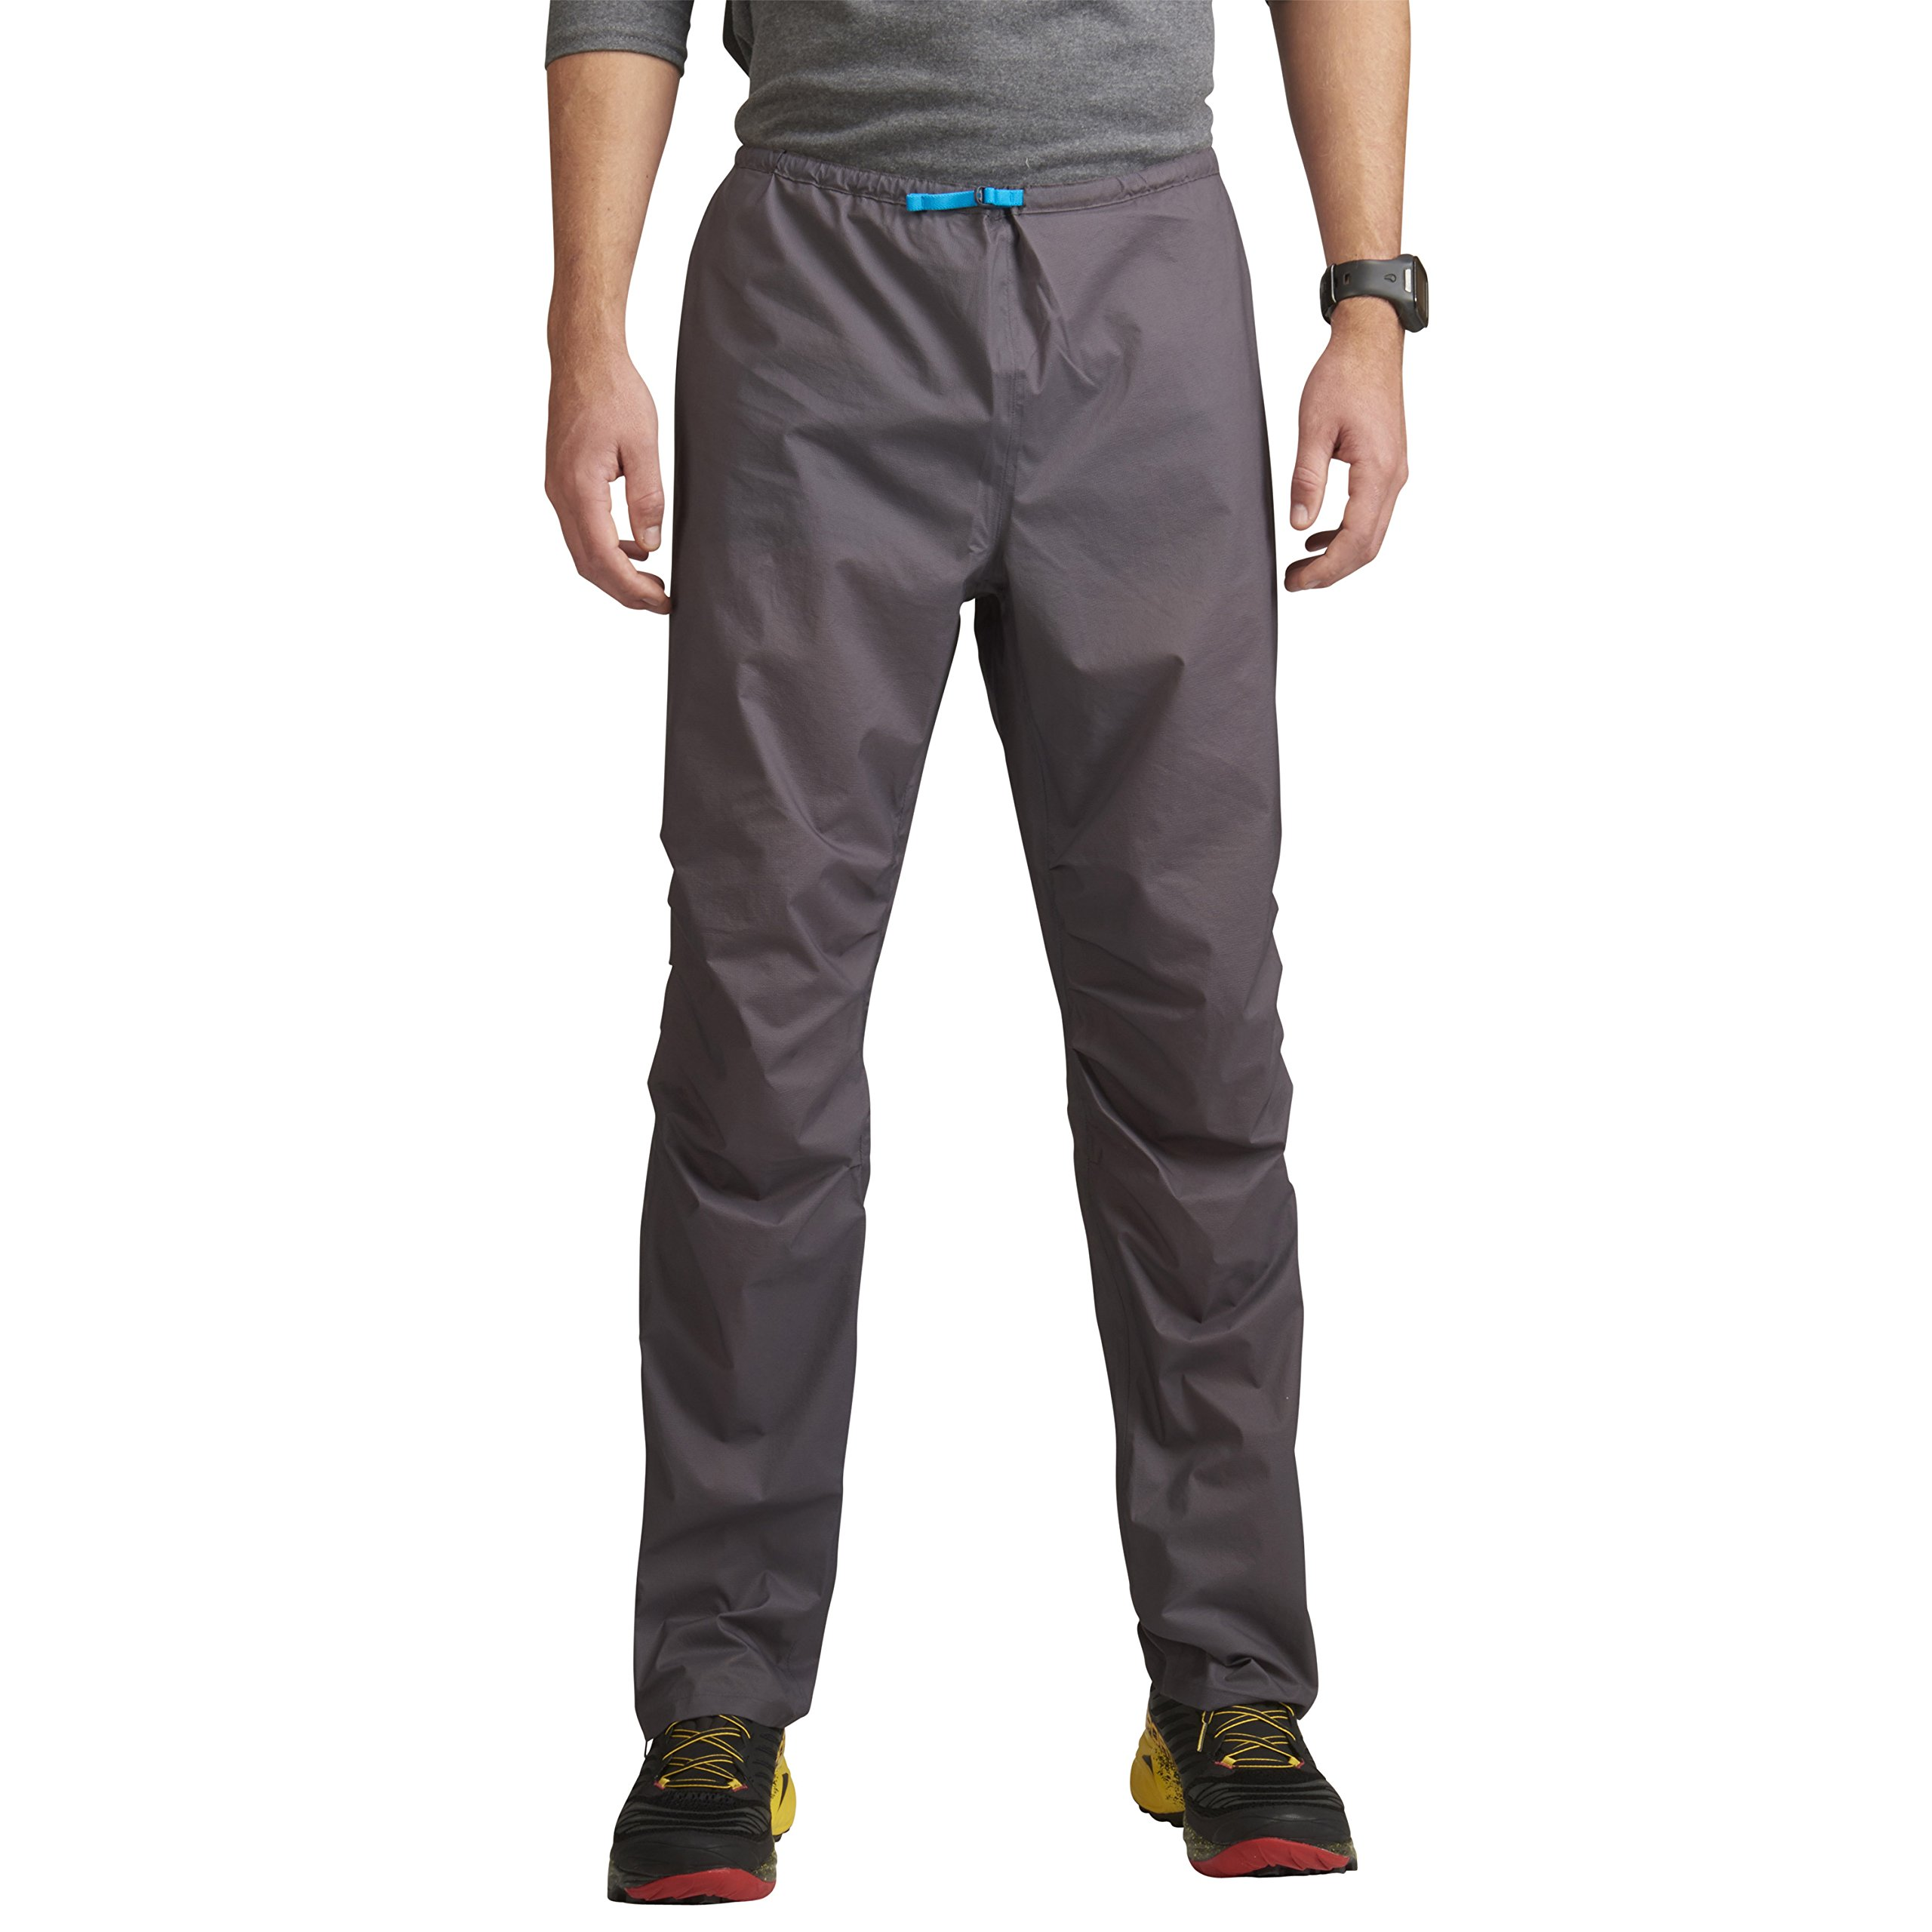 Ultimate Direction Men's Ultra Pants V2, Slate, X-Large by Ultimate Direction